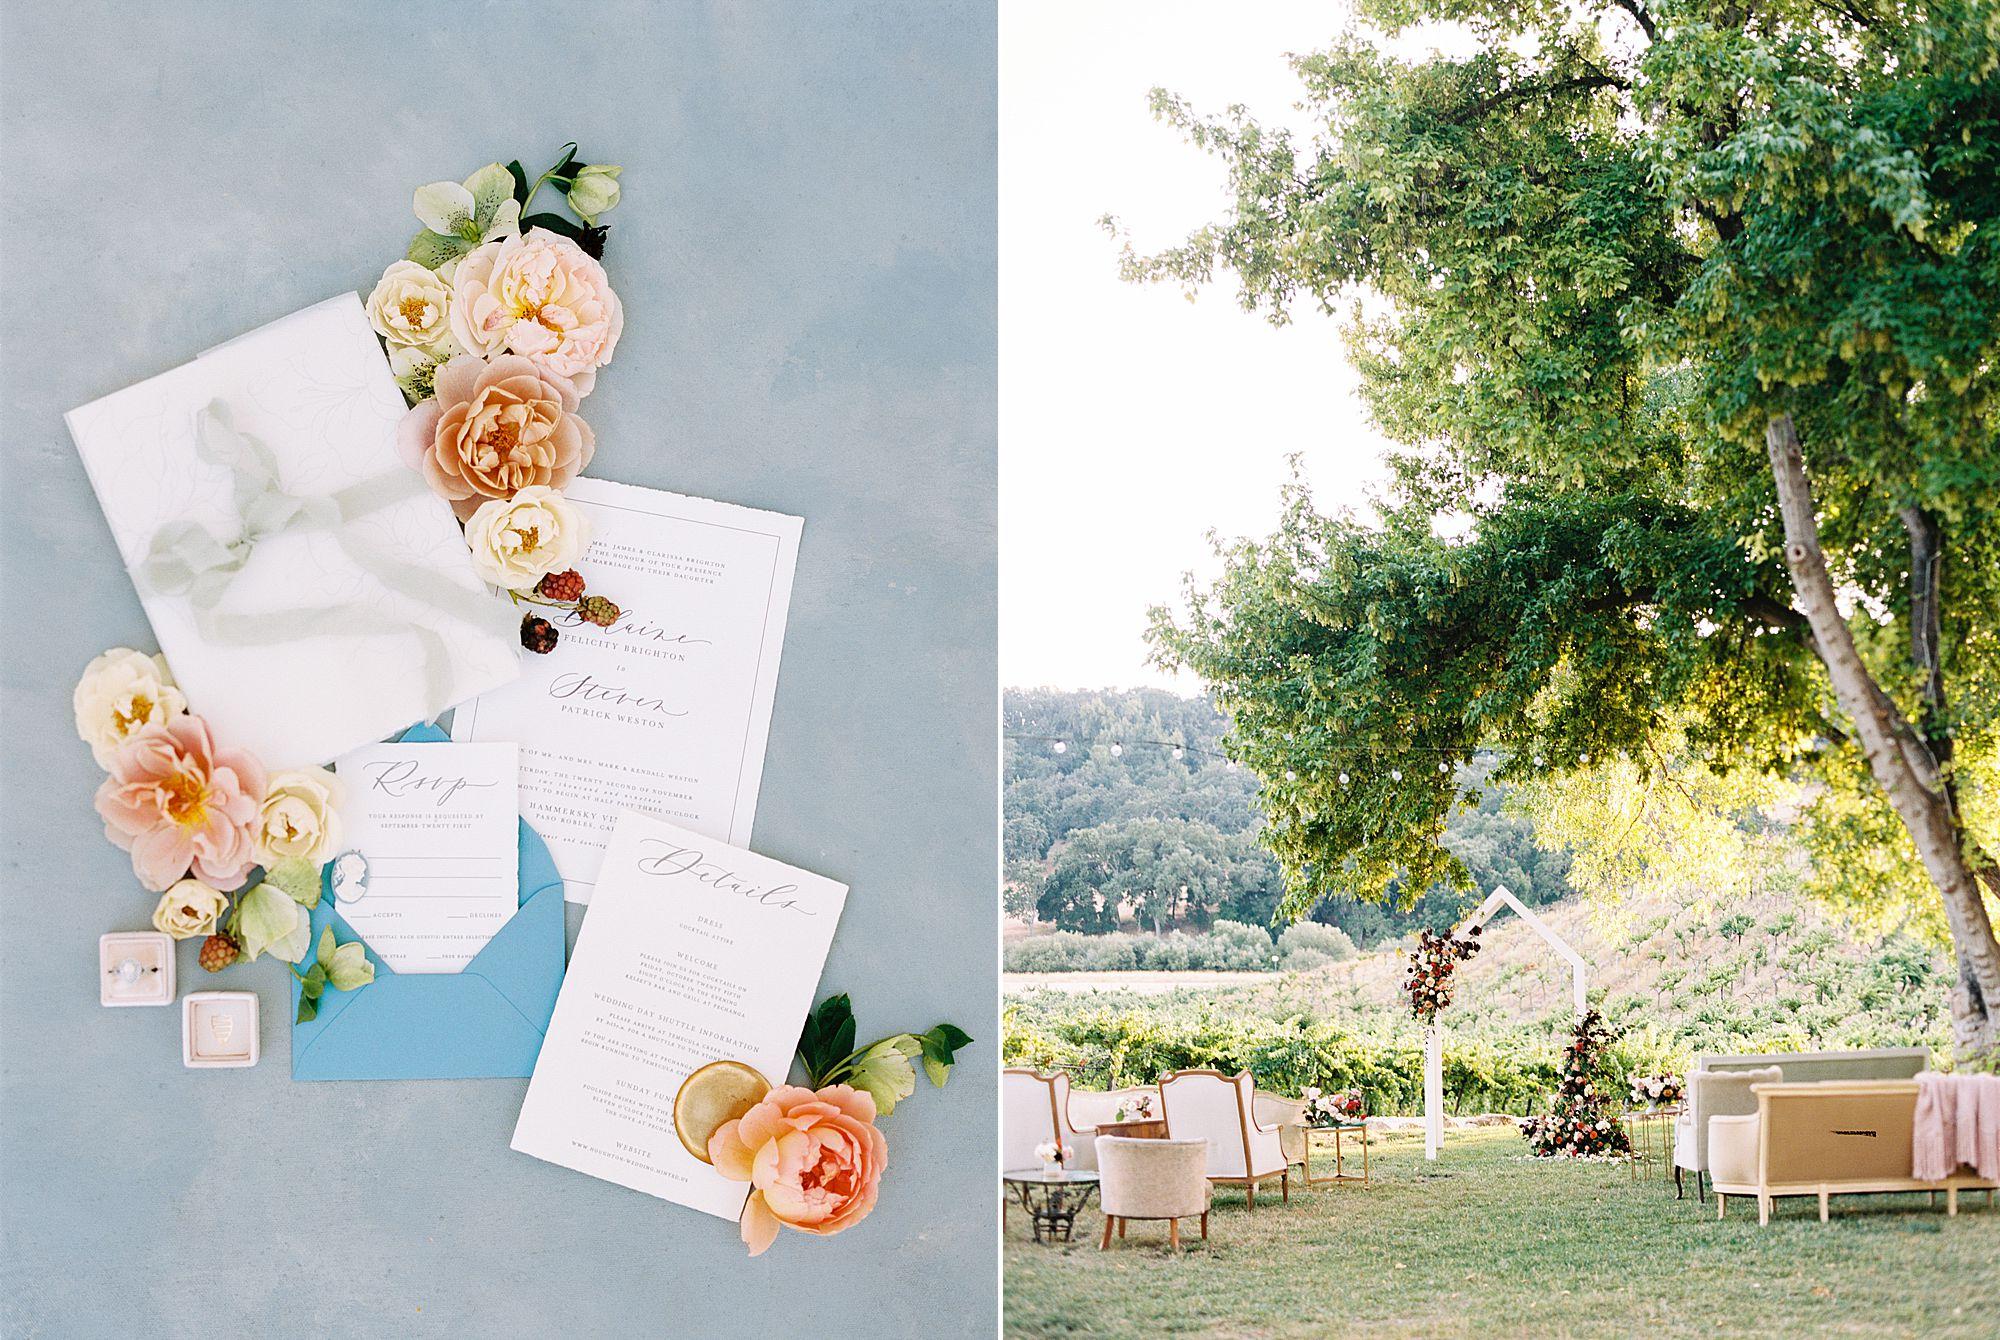 HammerSky Wedding Inspiration Featured on Hey Wedding Lady with Vanessa Noel Events - Ashley Baumgartner - SLO Wedding Photographer_0003.jpg